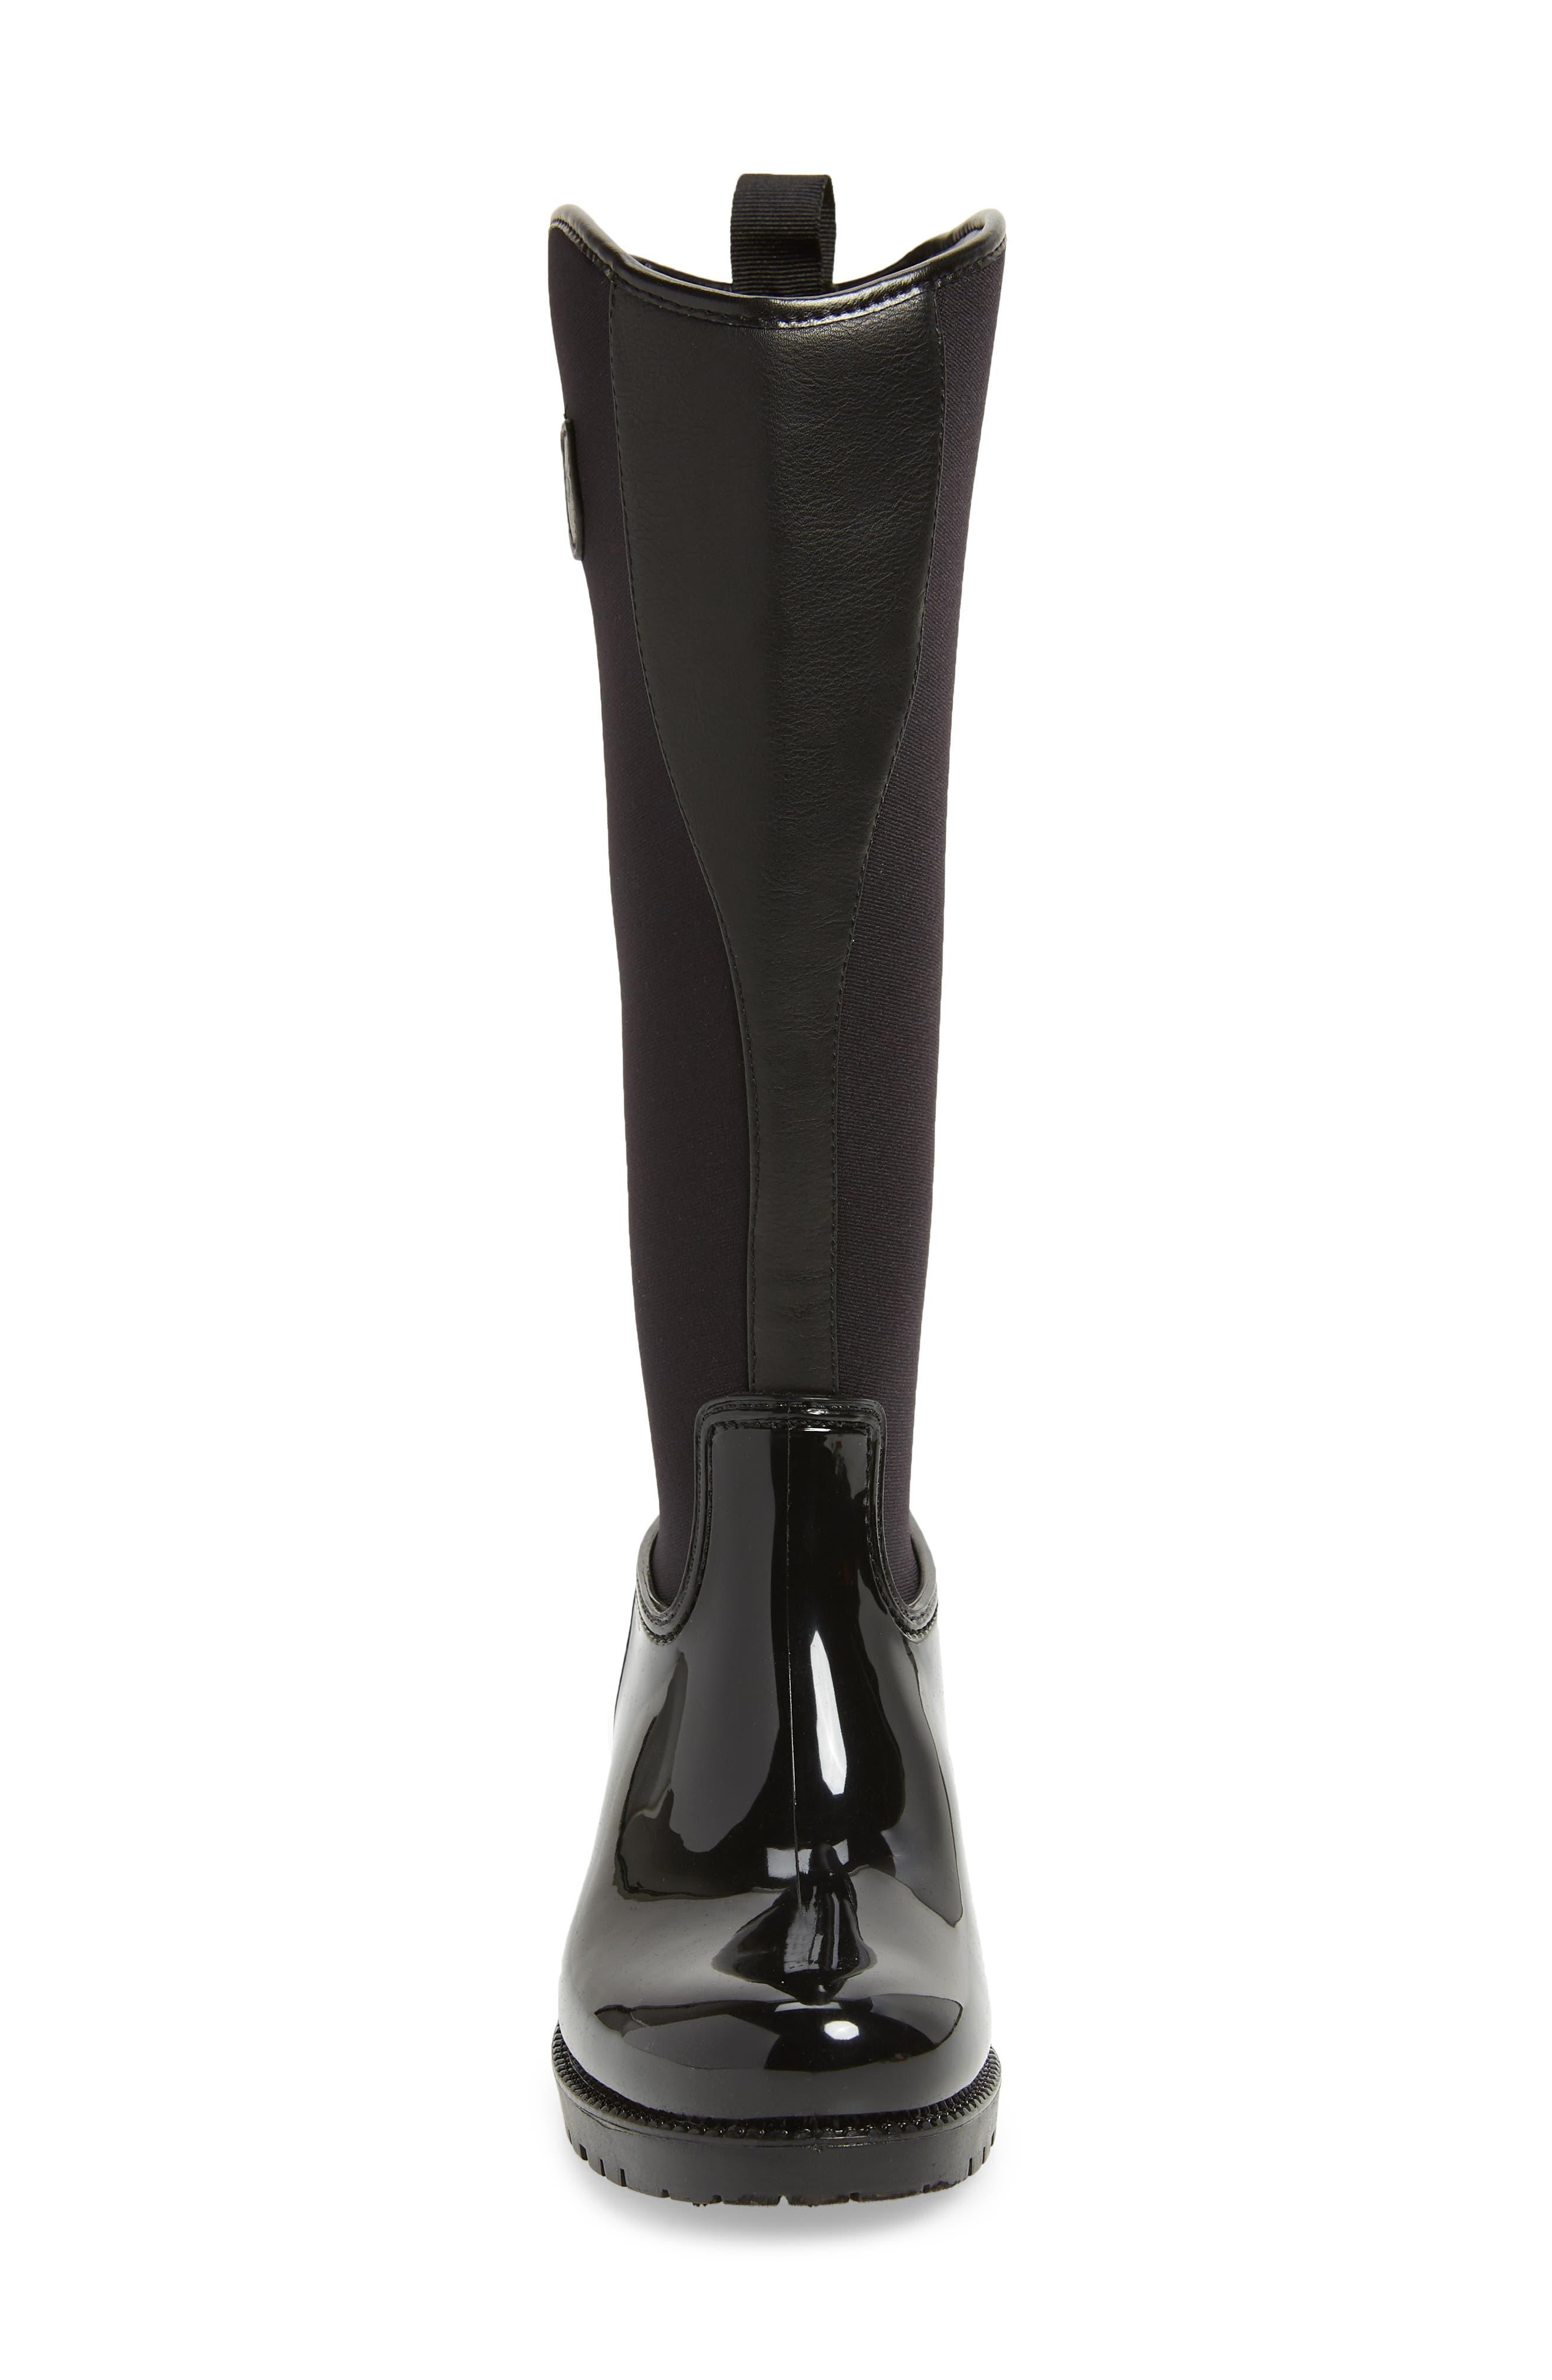 Parma 2 Tall Waterproof Rain Boot,                             Alternate thumbnail 4, color,                             BLACK FABRIC